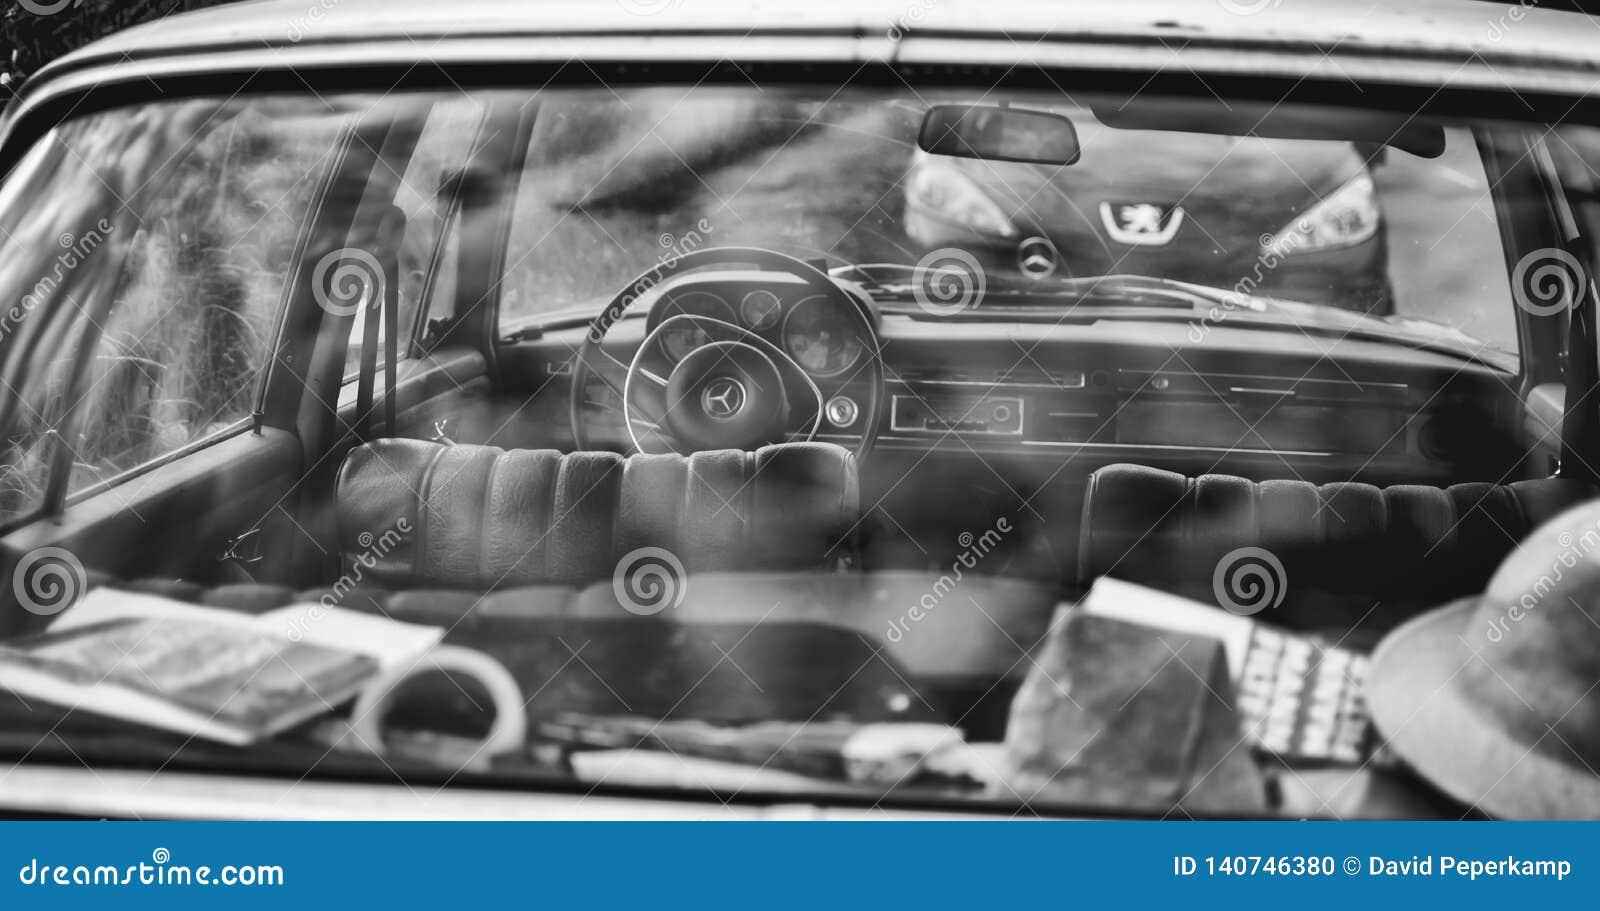 Classic Mercedes 280 S rear window